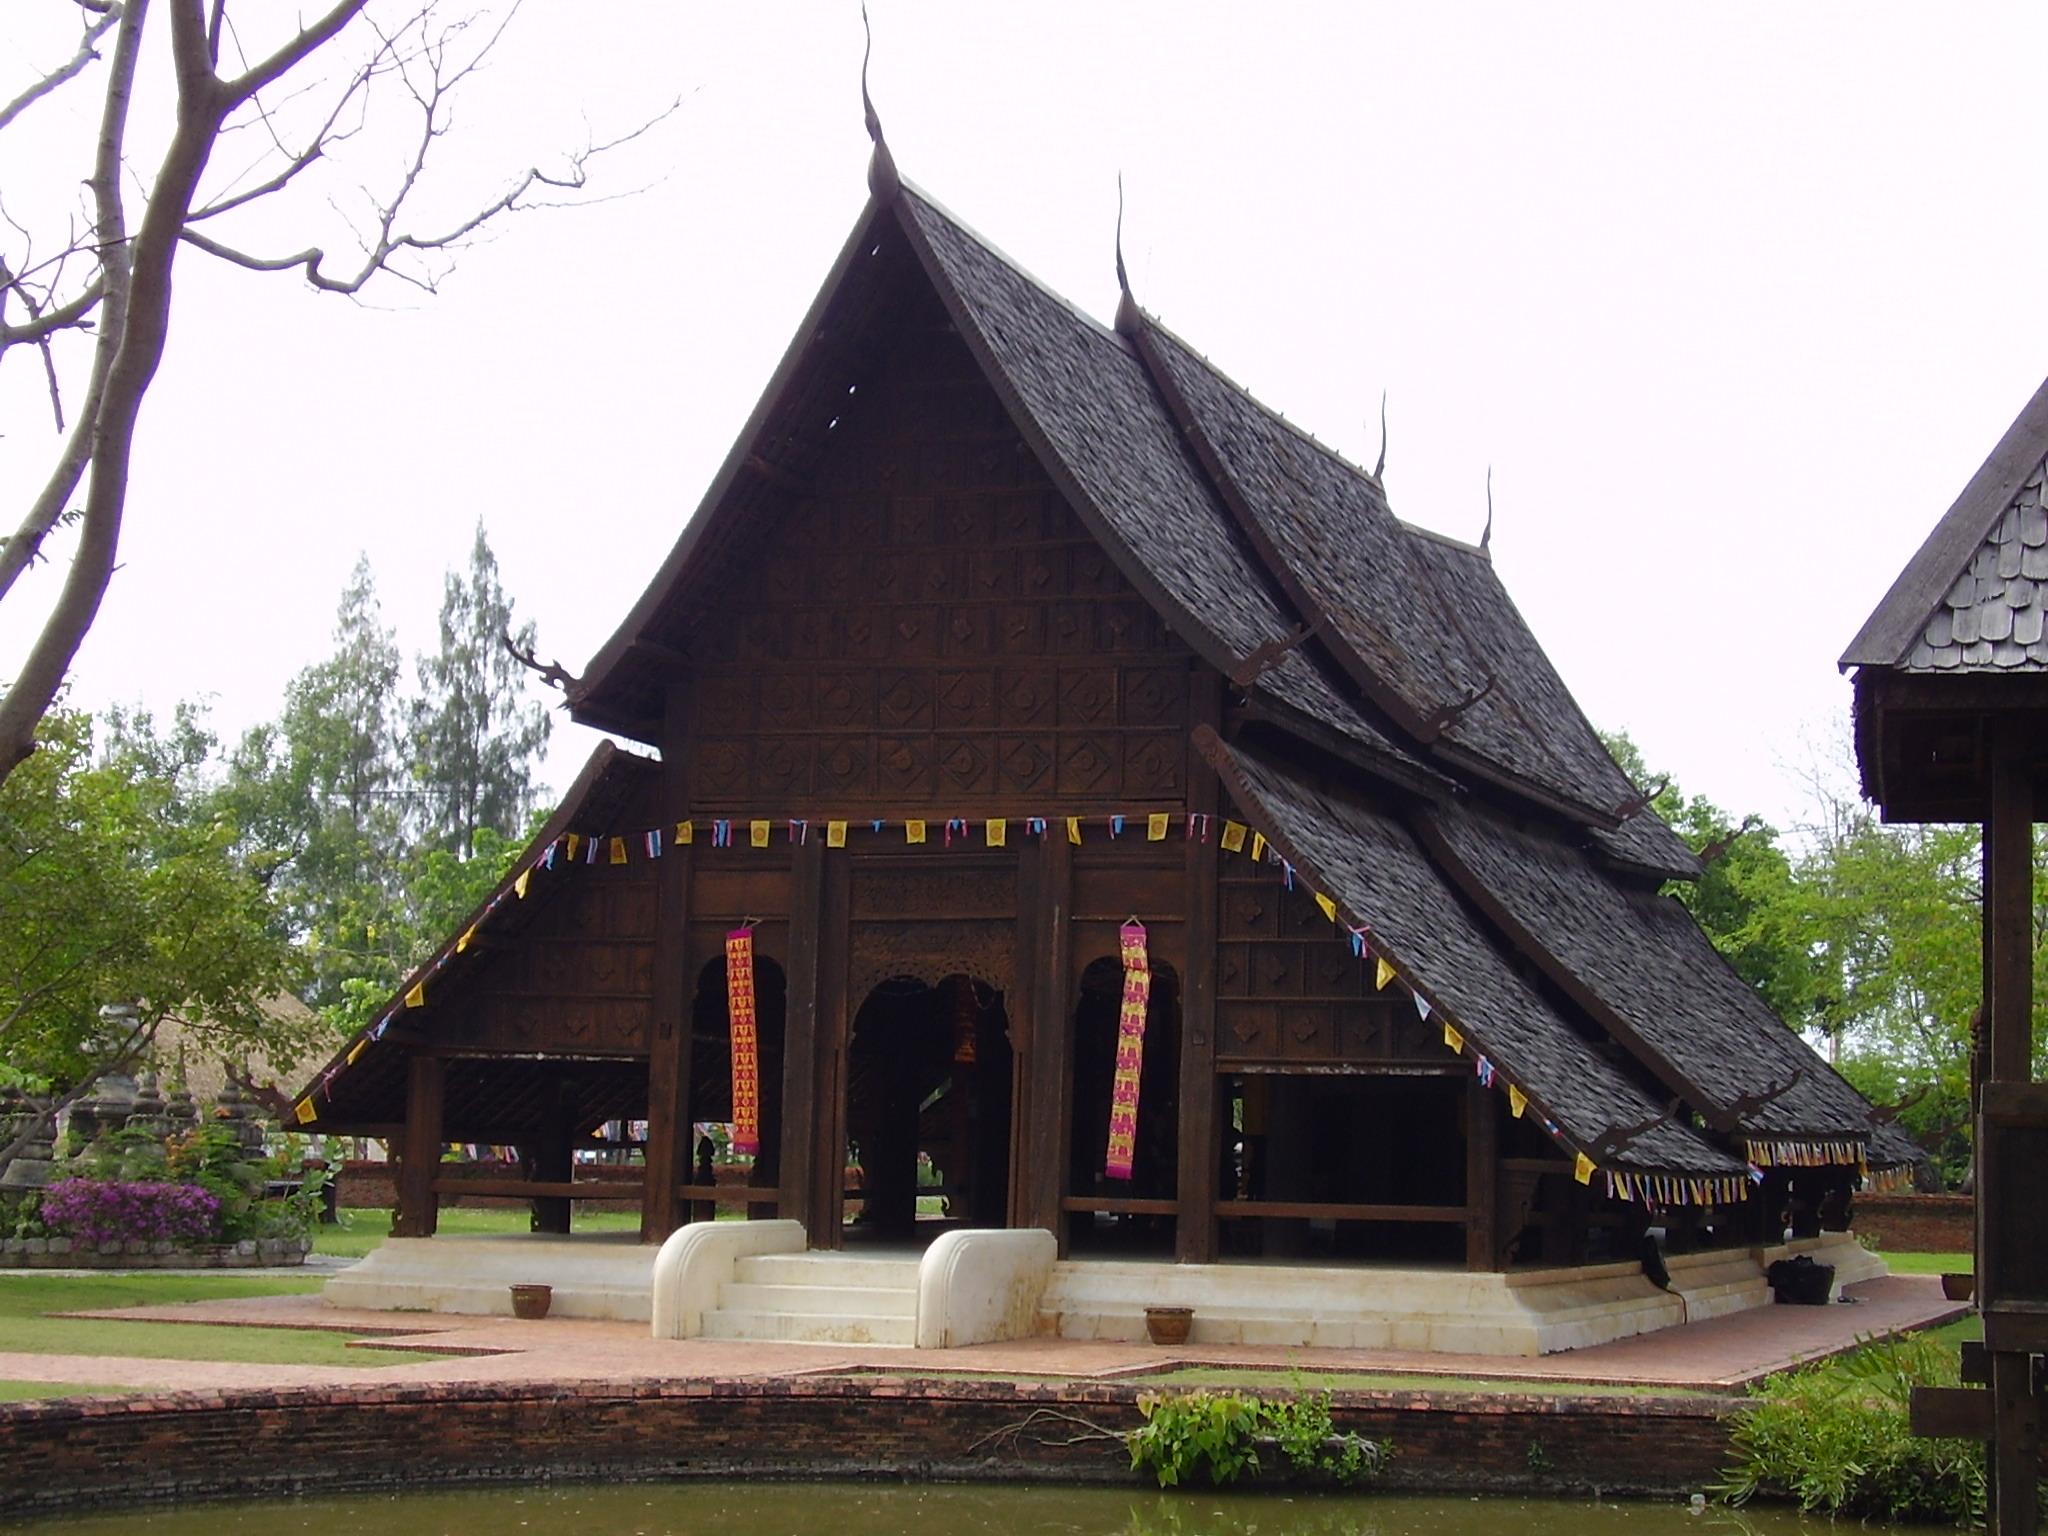 Viking Architecture: Ben Salmons's Blog